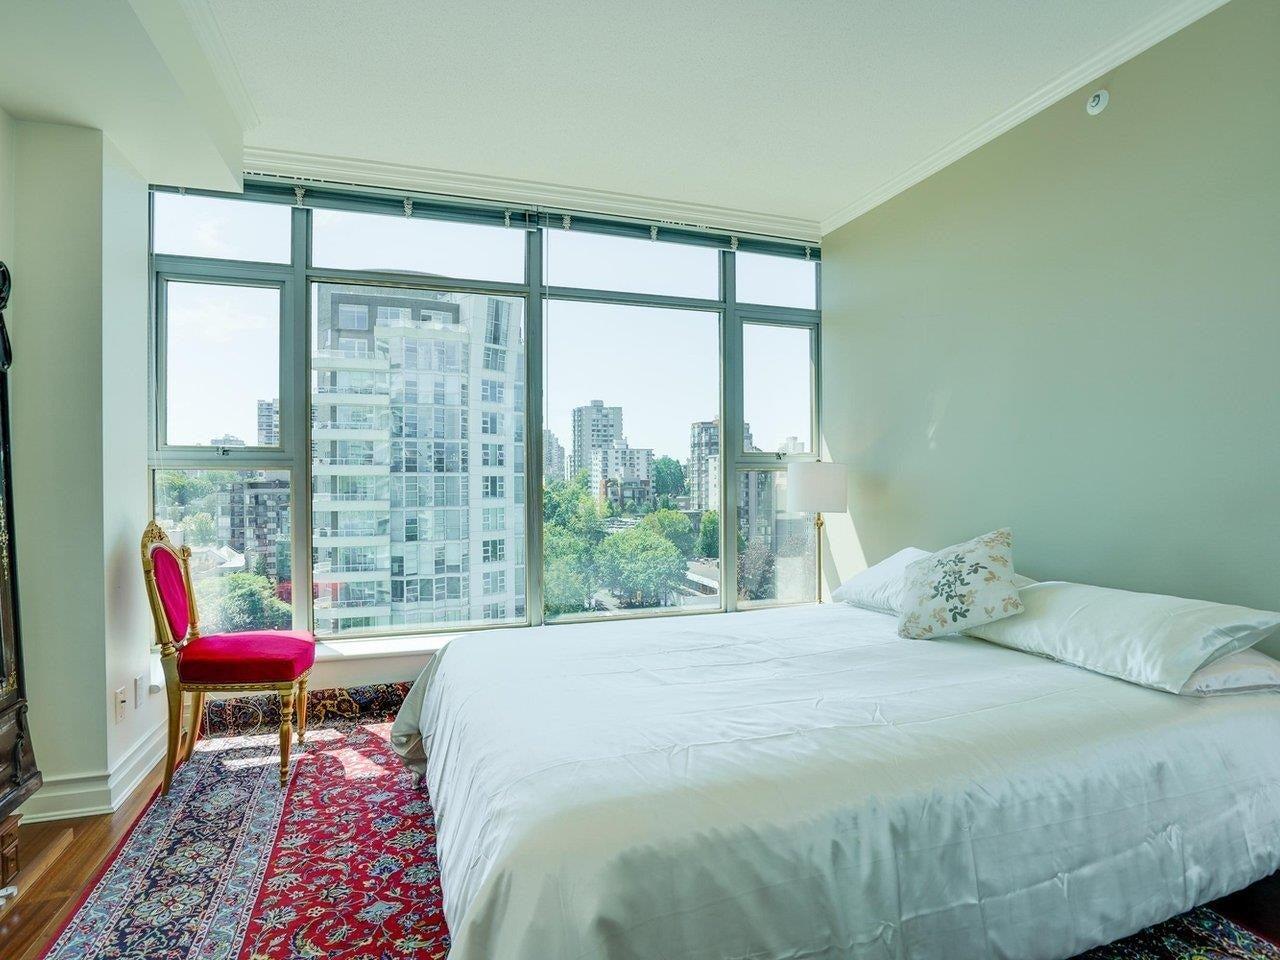 1003 1790 BAYSHORE DRIVE - Coal Harbour Apartment/Condo for sale, 1 Bedroom (R2606481) - #16